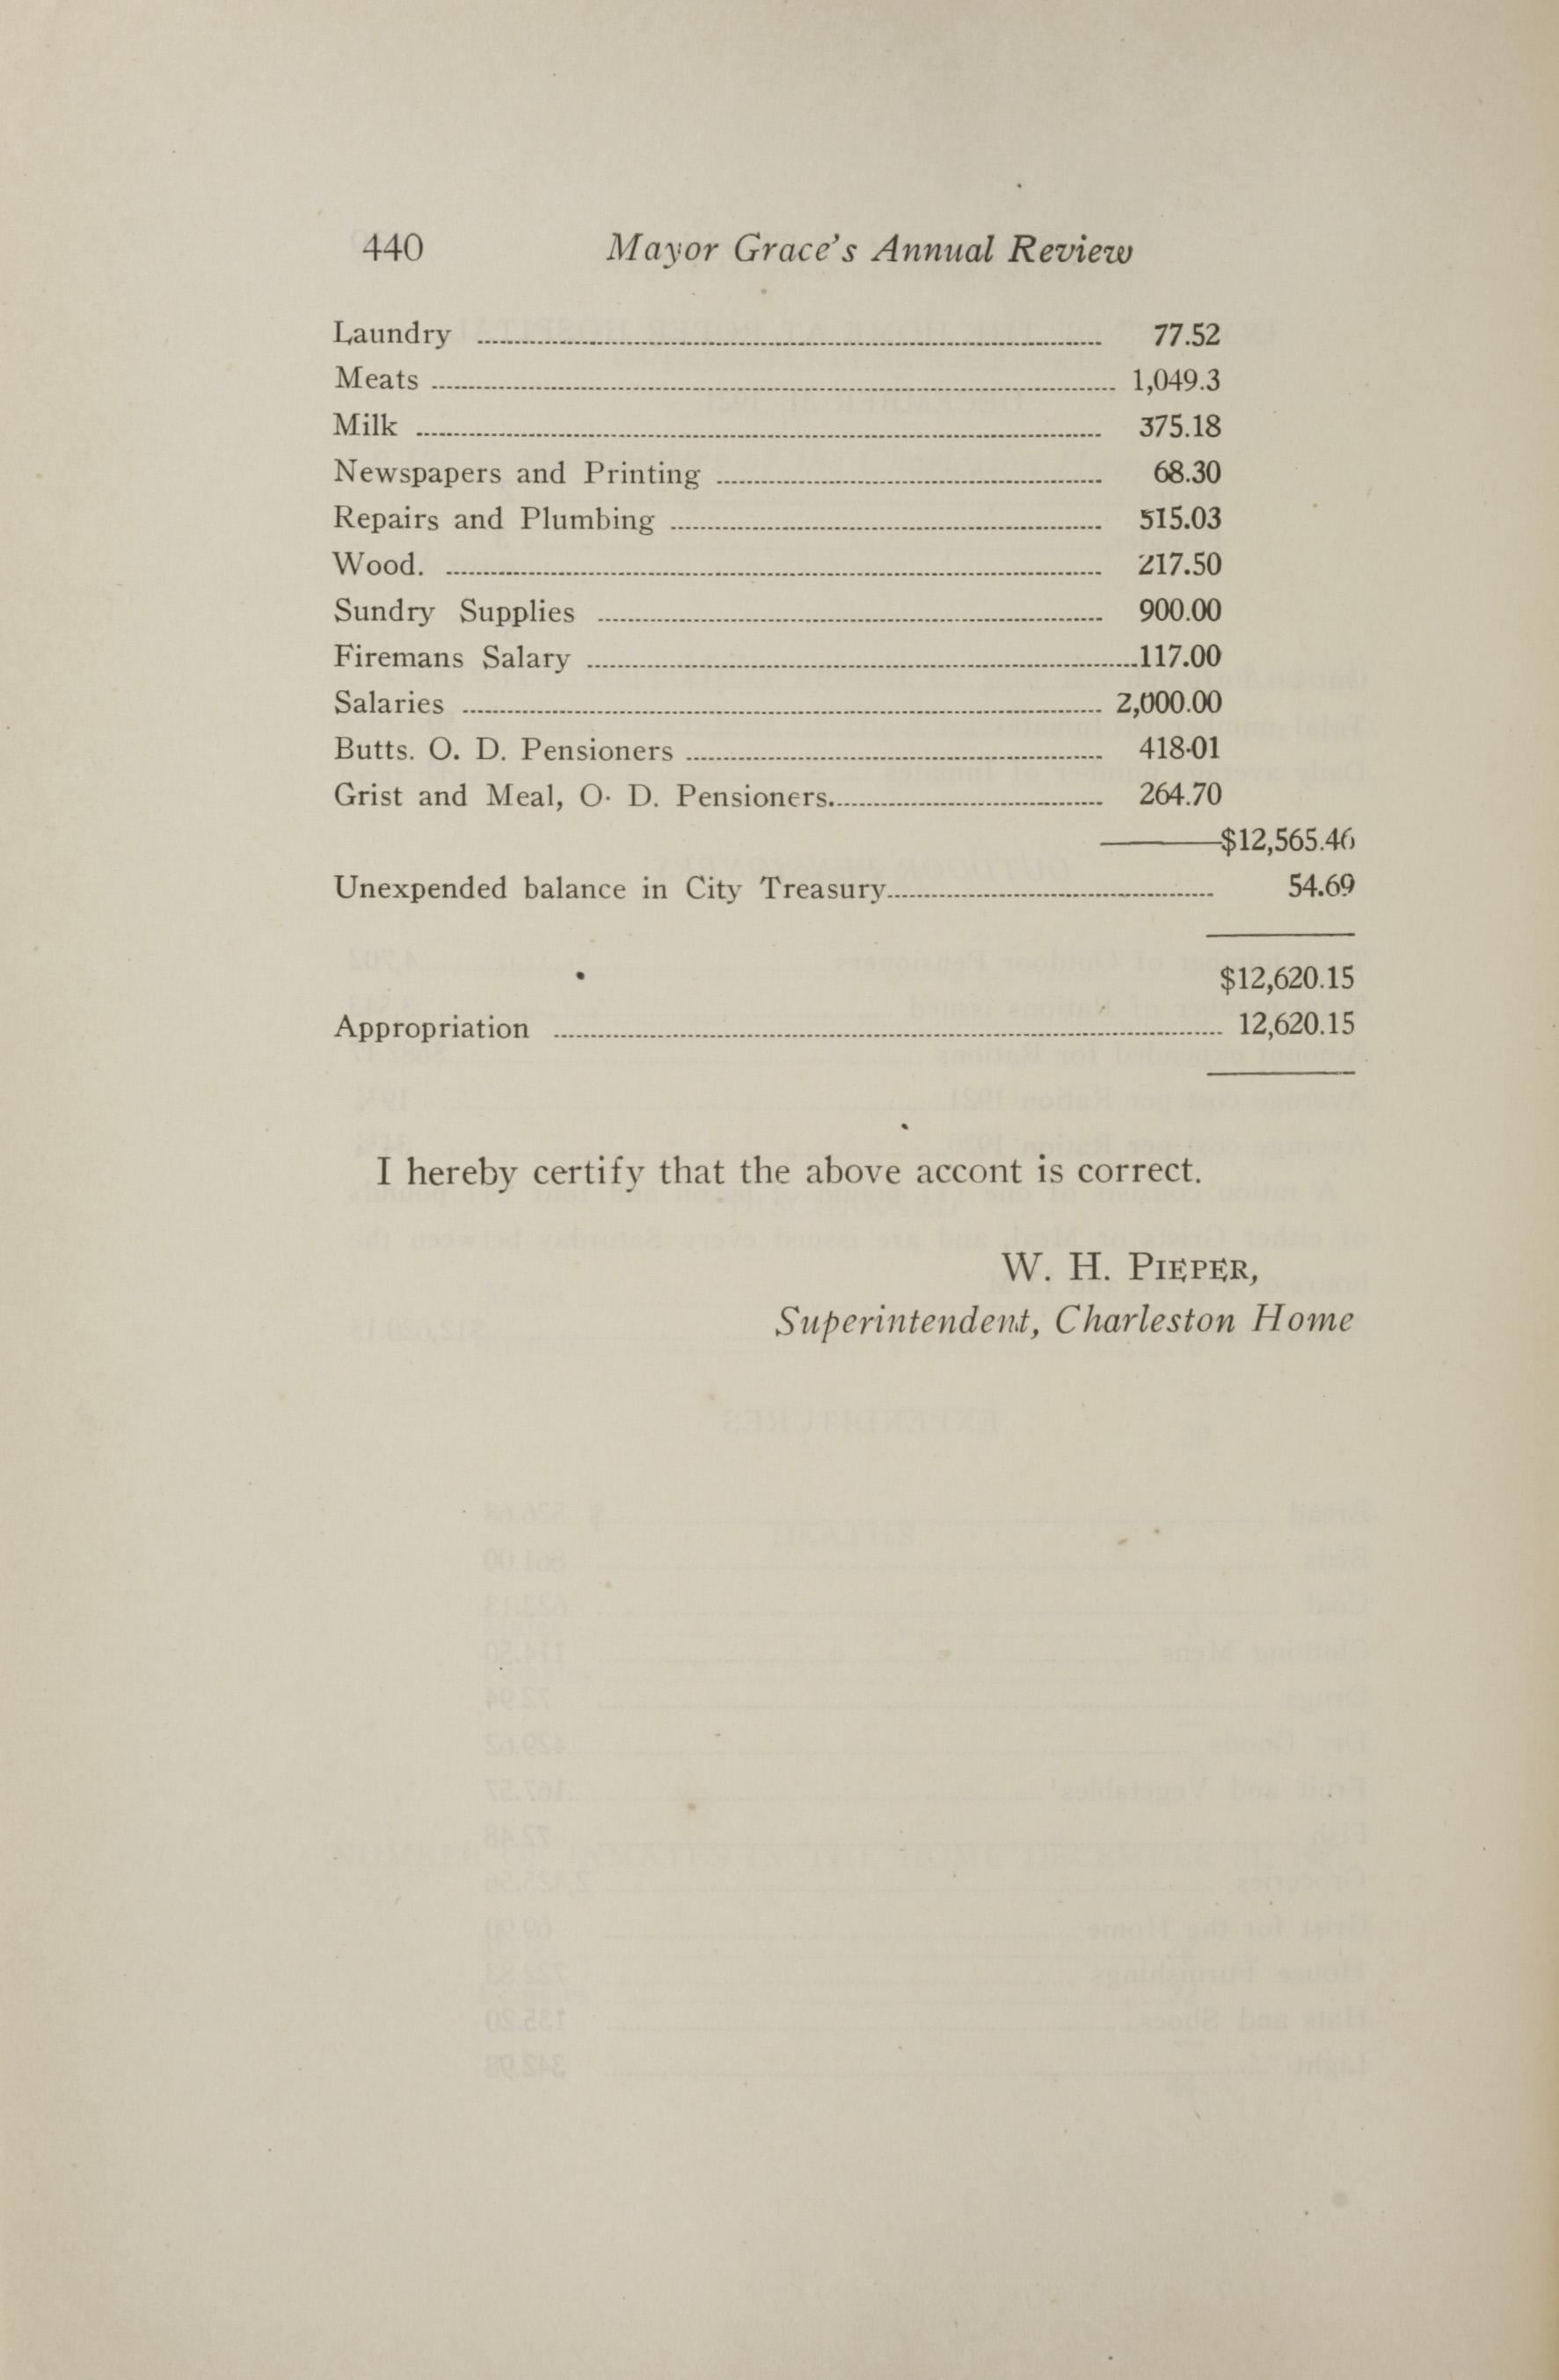 Charleston Yearbook, 1921, page 440